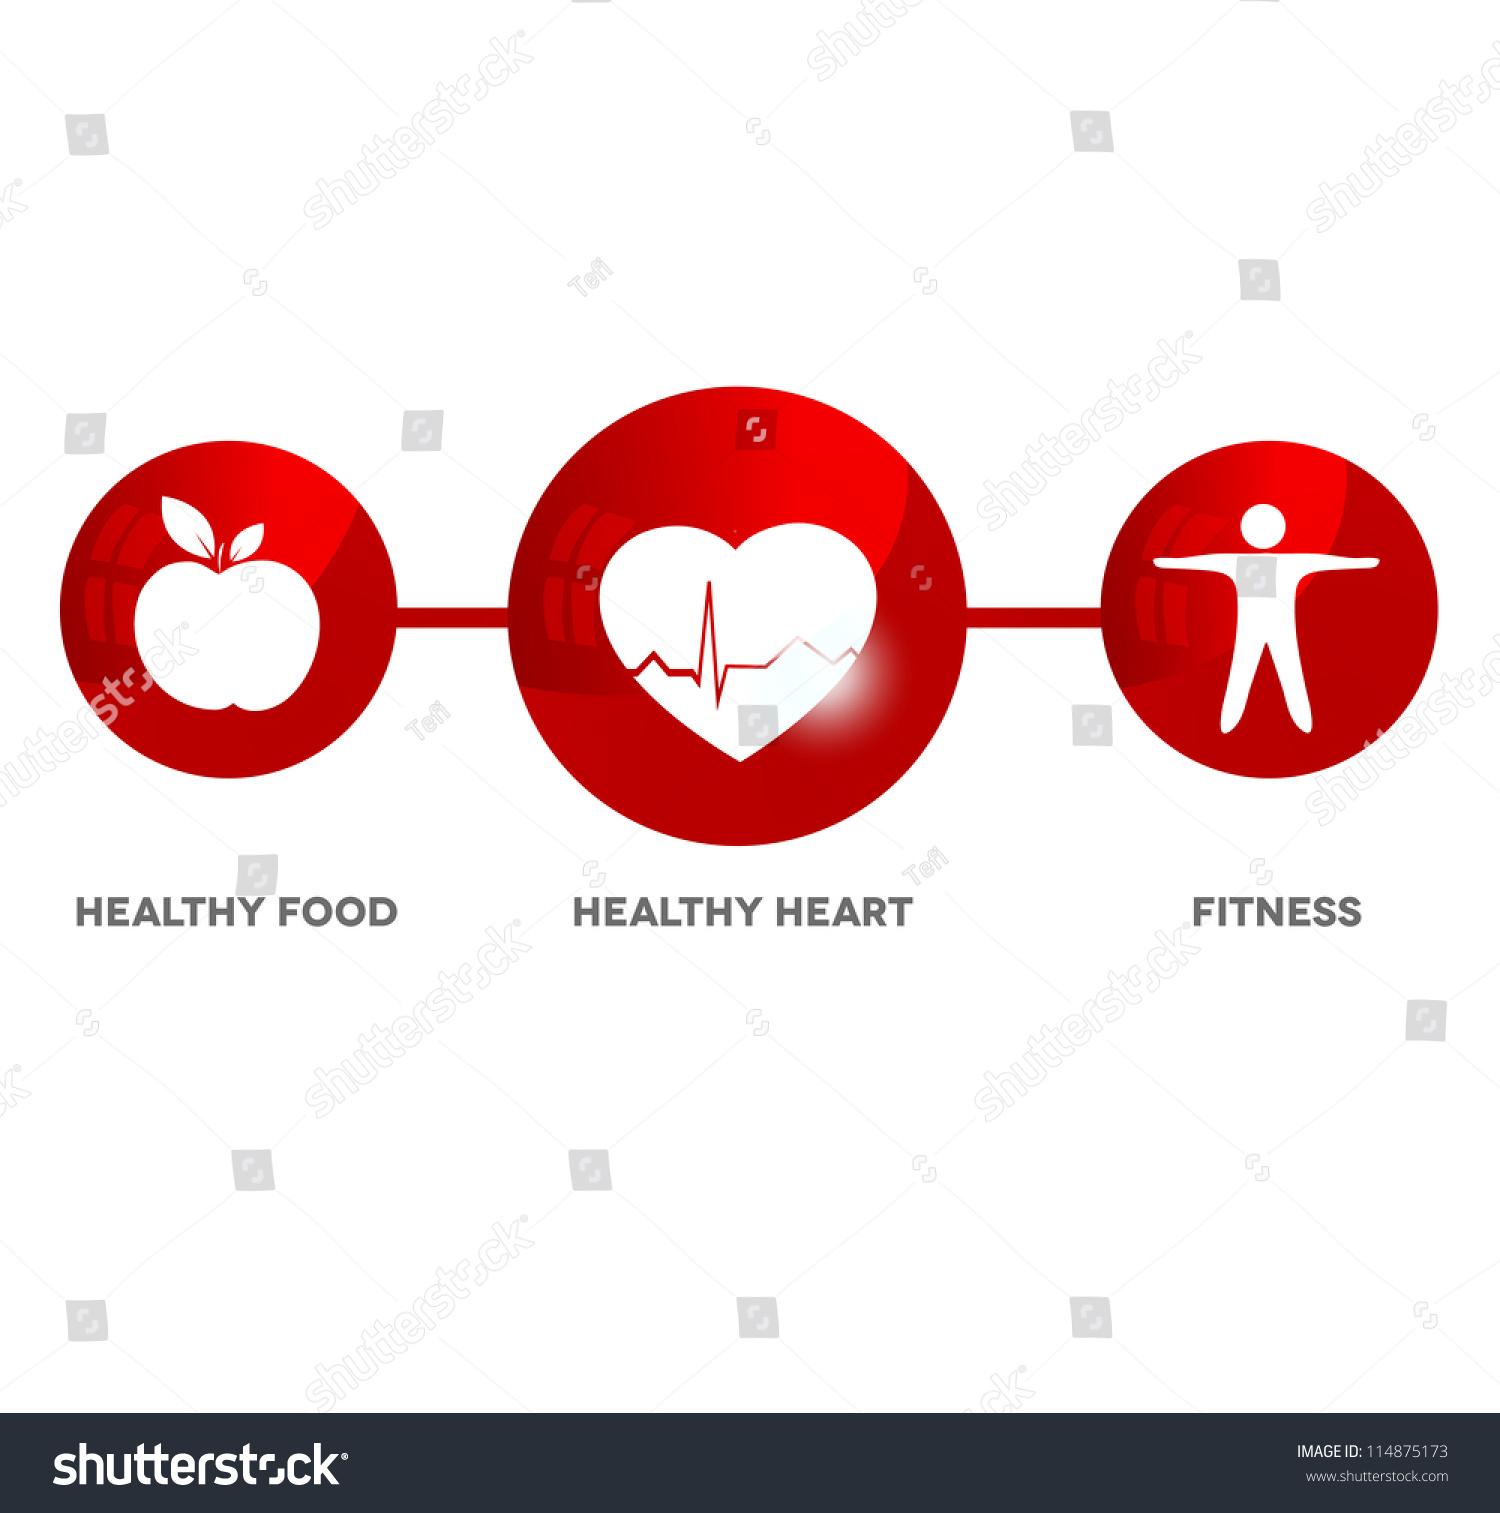 Heart Healthy Food Icon